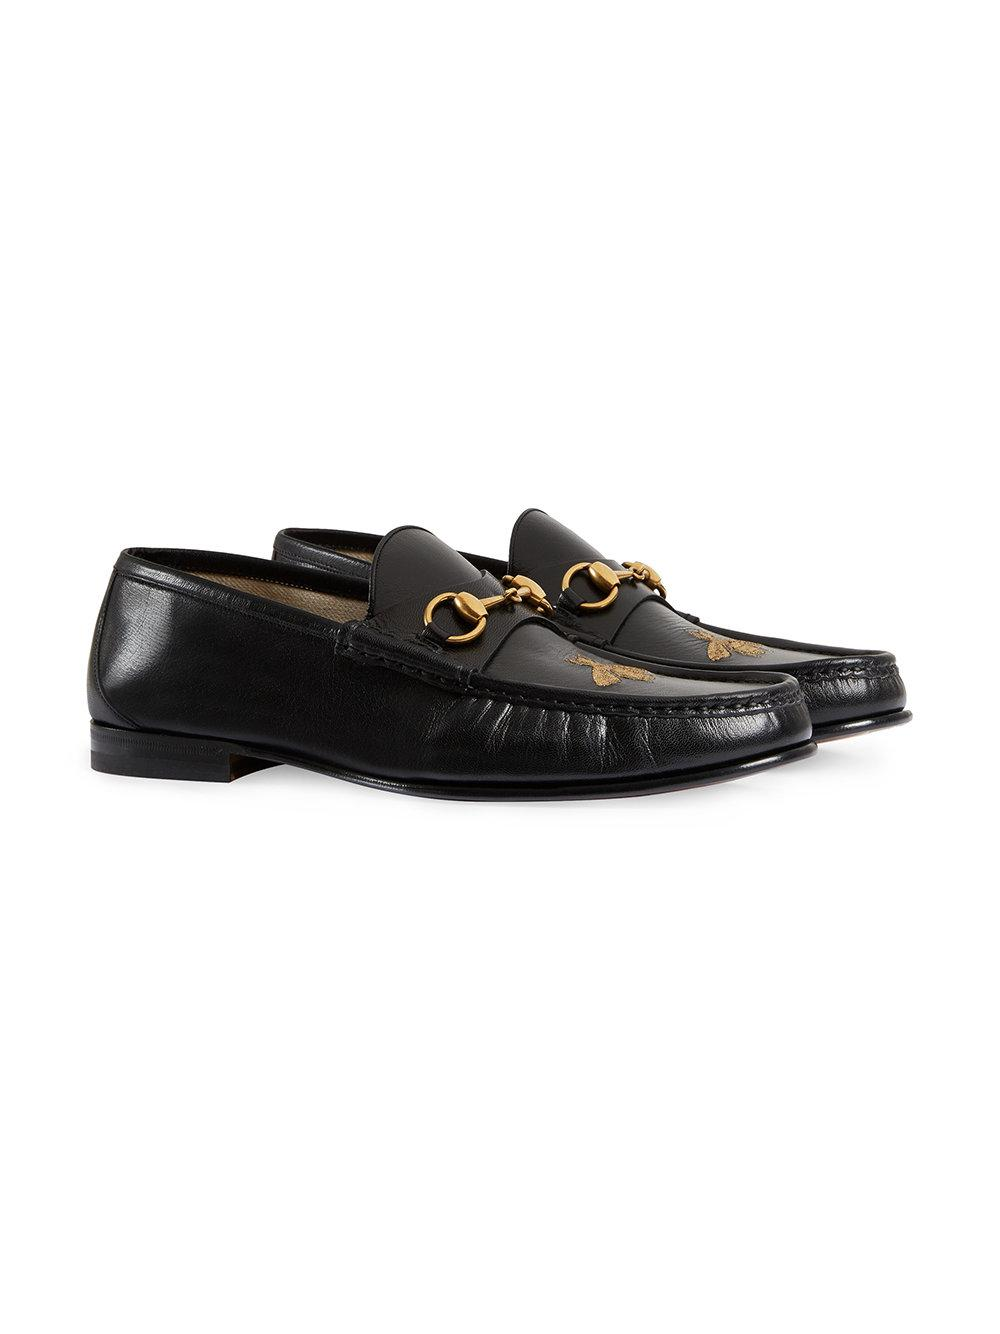 f6c57ea1c4a Lyst - Gucci Men s Horsebit Leather Loafer in Black for Men - Save 12%